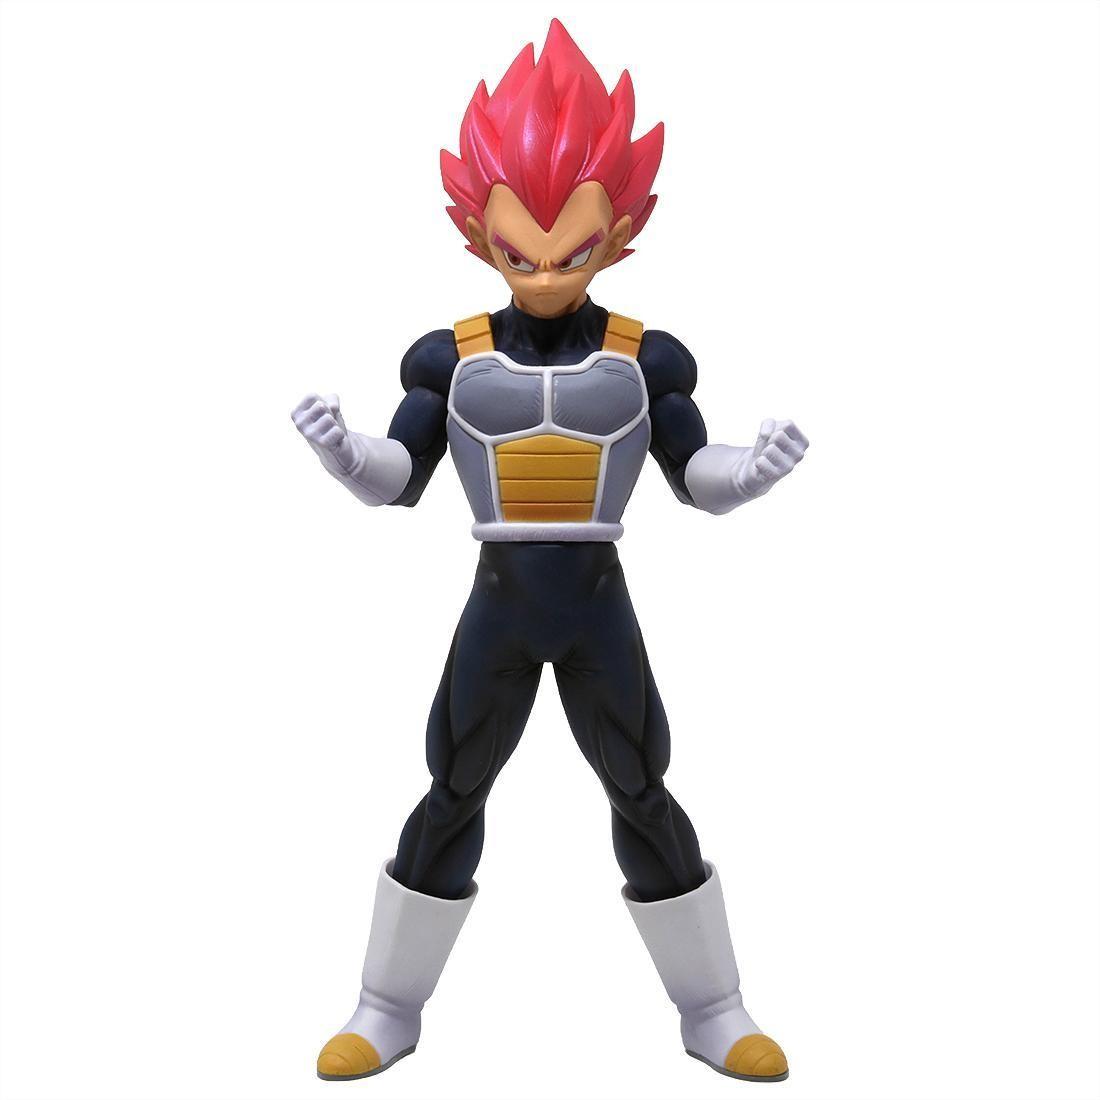 Banpresto Dragon Ball Super the Movie Chokoku Buyuden Super Saiyan God Vegeta Figure (pink)